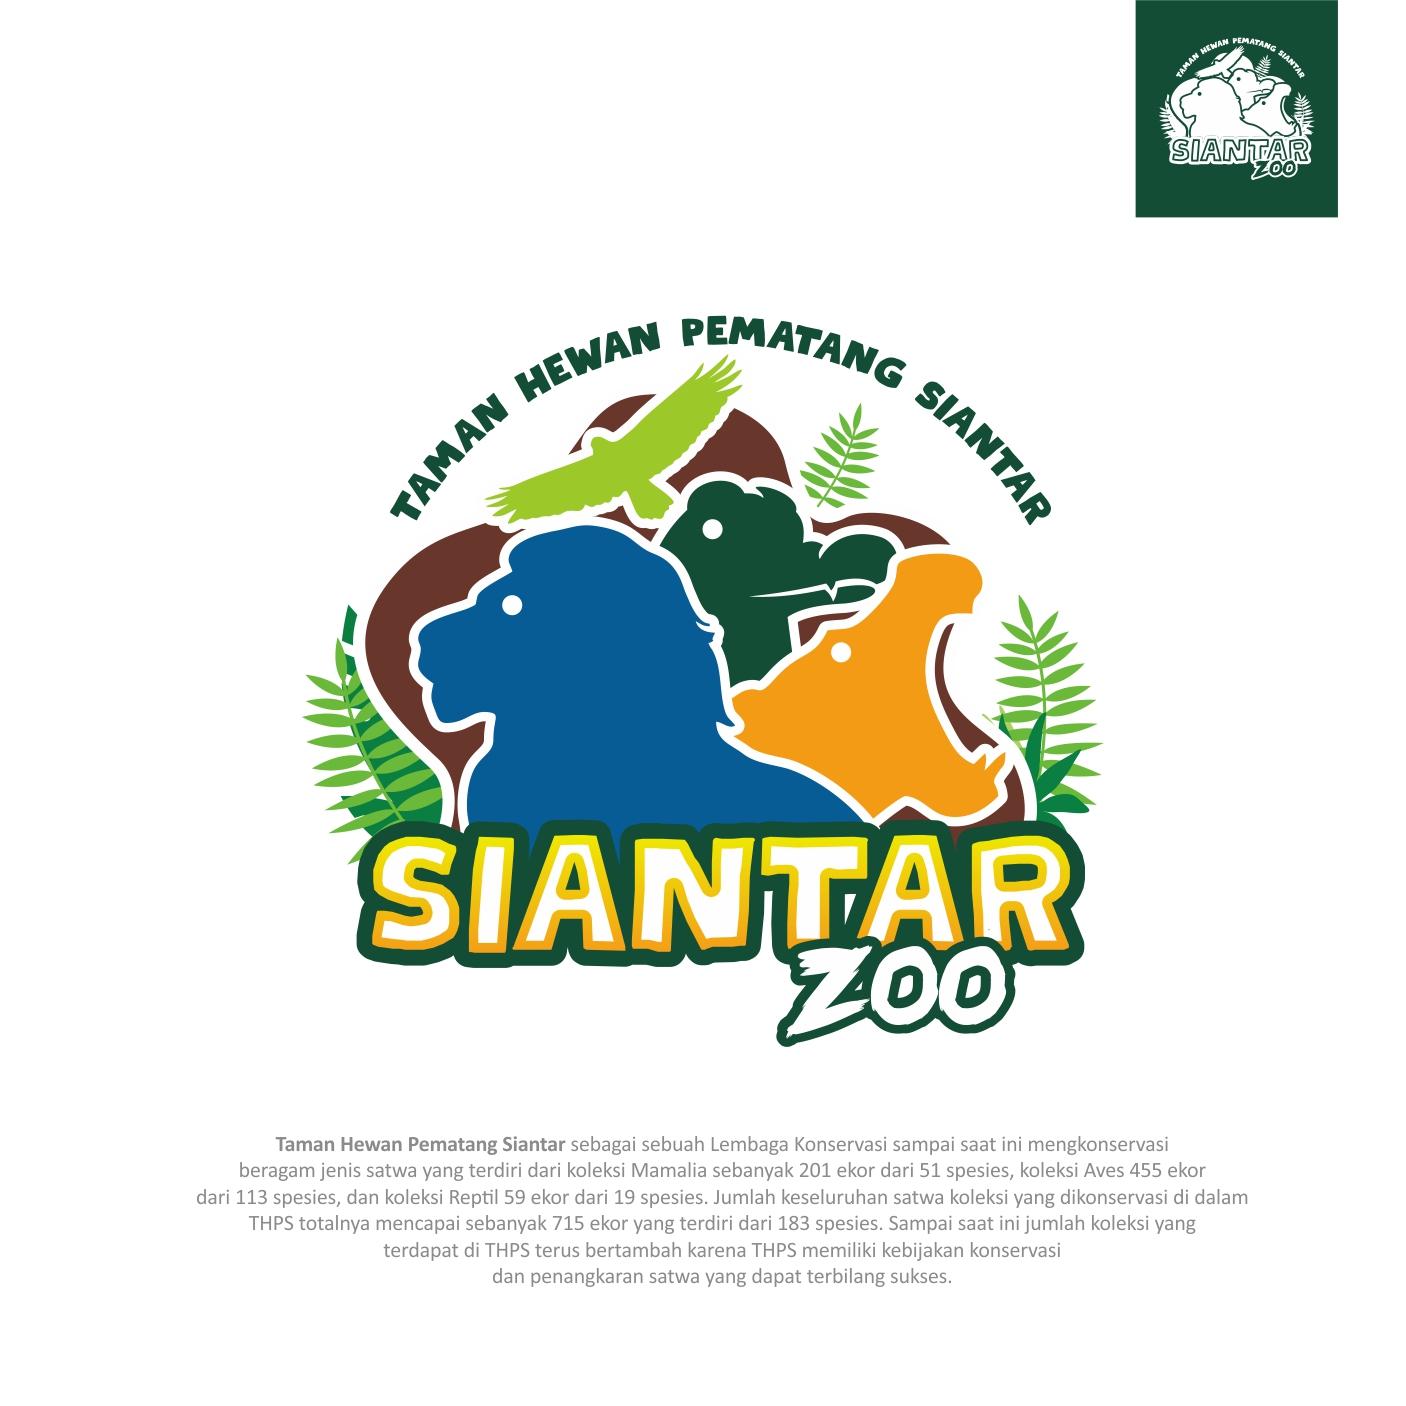 9200 Gambar Binatang Untuk Logo Terbaik